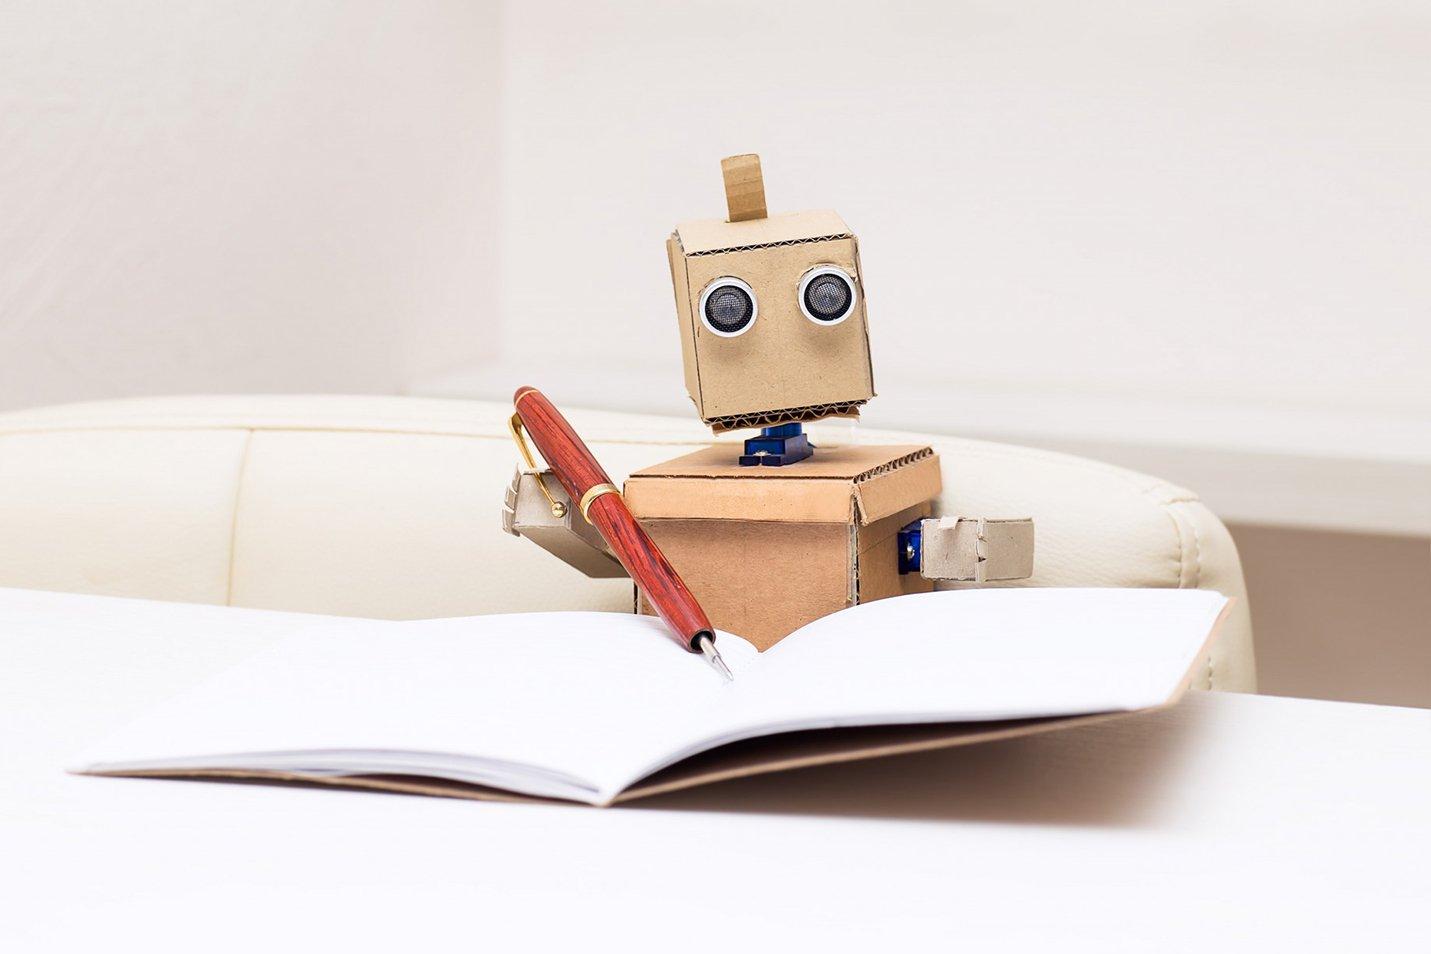 cardboard robot writing in notebook